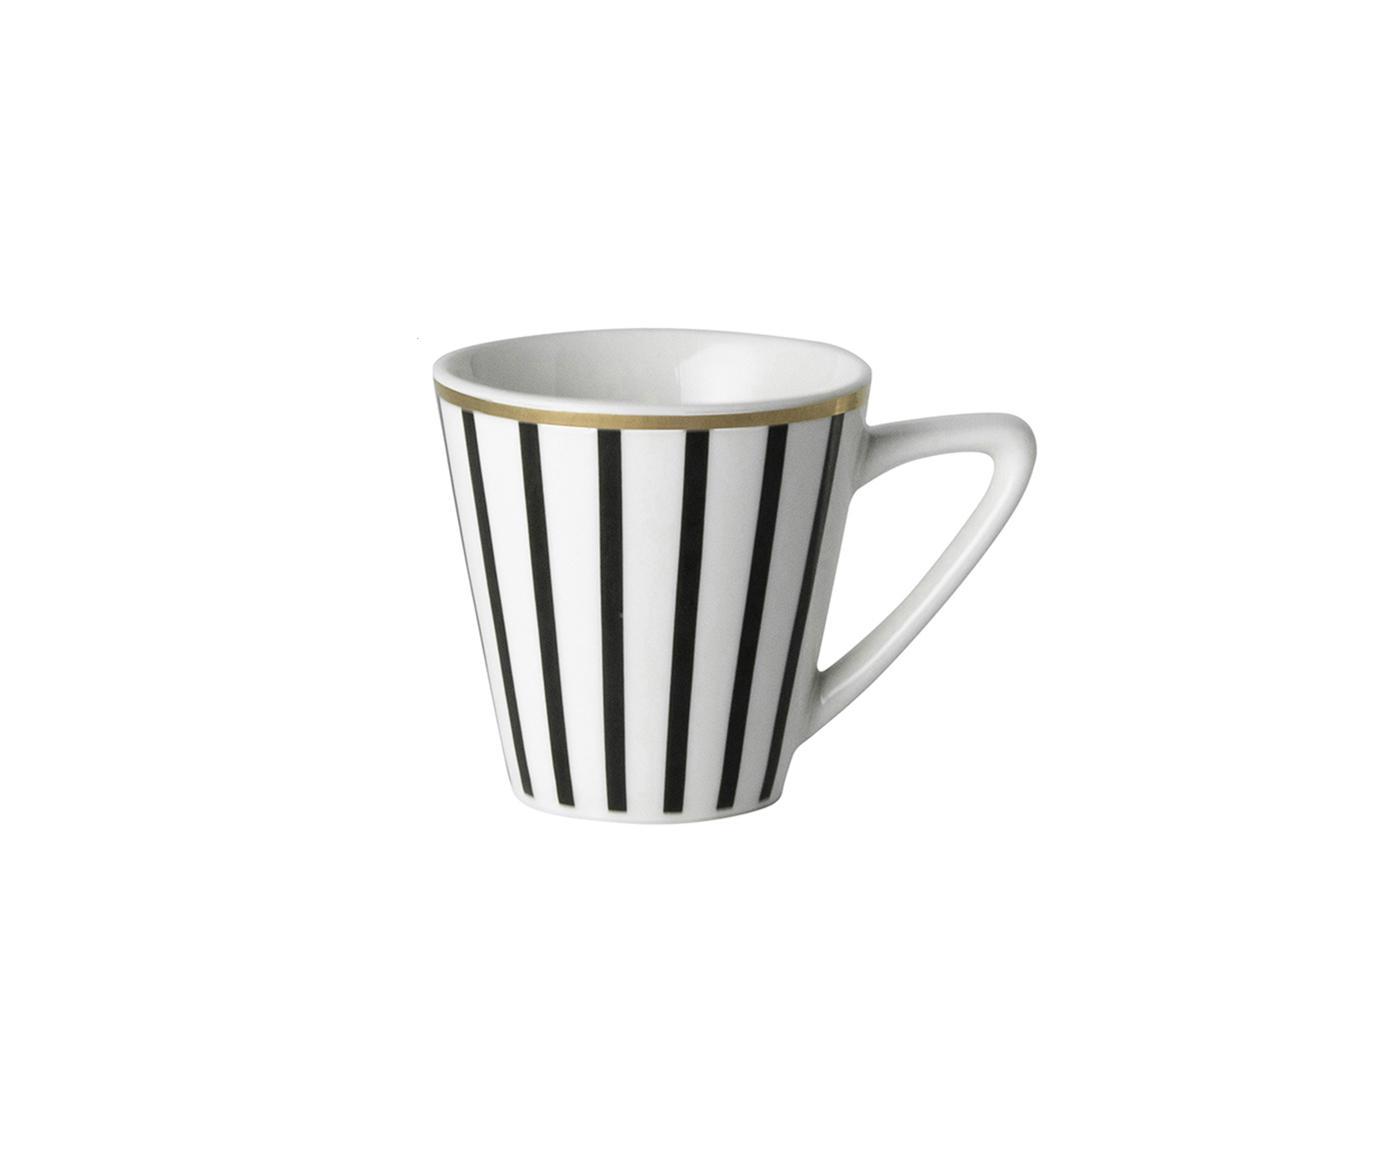 Tazas de café Pluto Loft, 4uds., Porcelana, Negro, blanco, Ø 6 x Al 6 cm